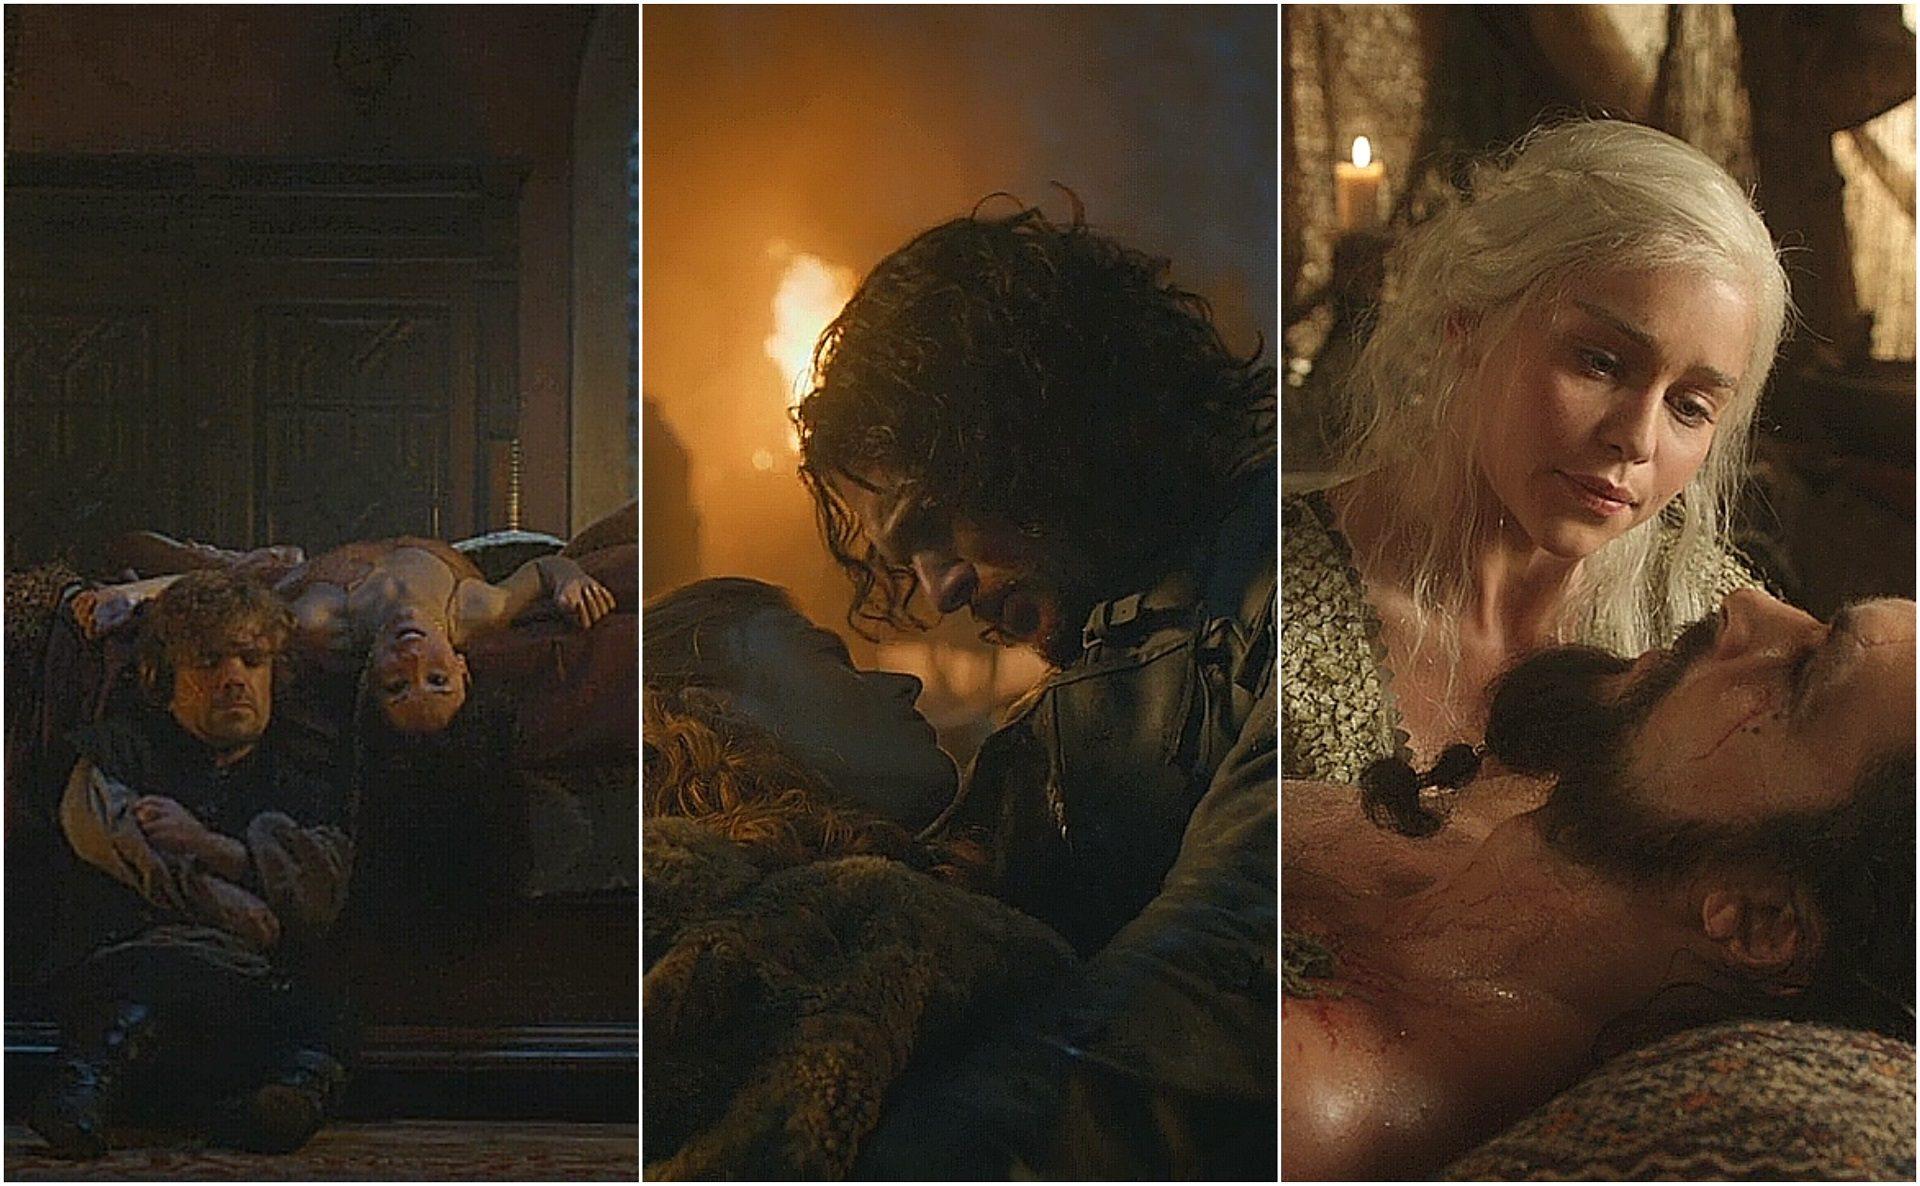 Tyrion Jon And Daenerys The Three Headed Dragon Theory